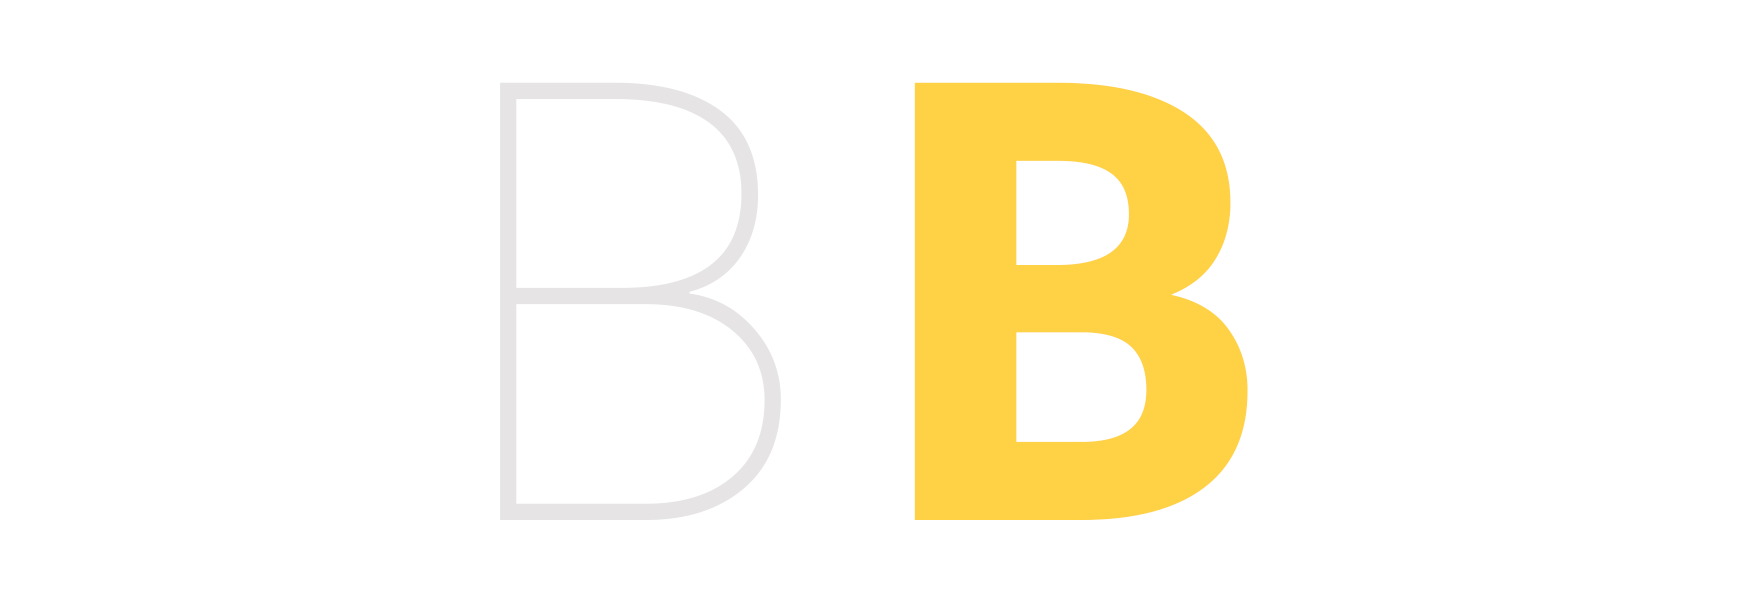 Designagentur-Stuttgart-Kreativbetrieb-Design-Lexikon-Bold-1